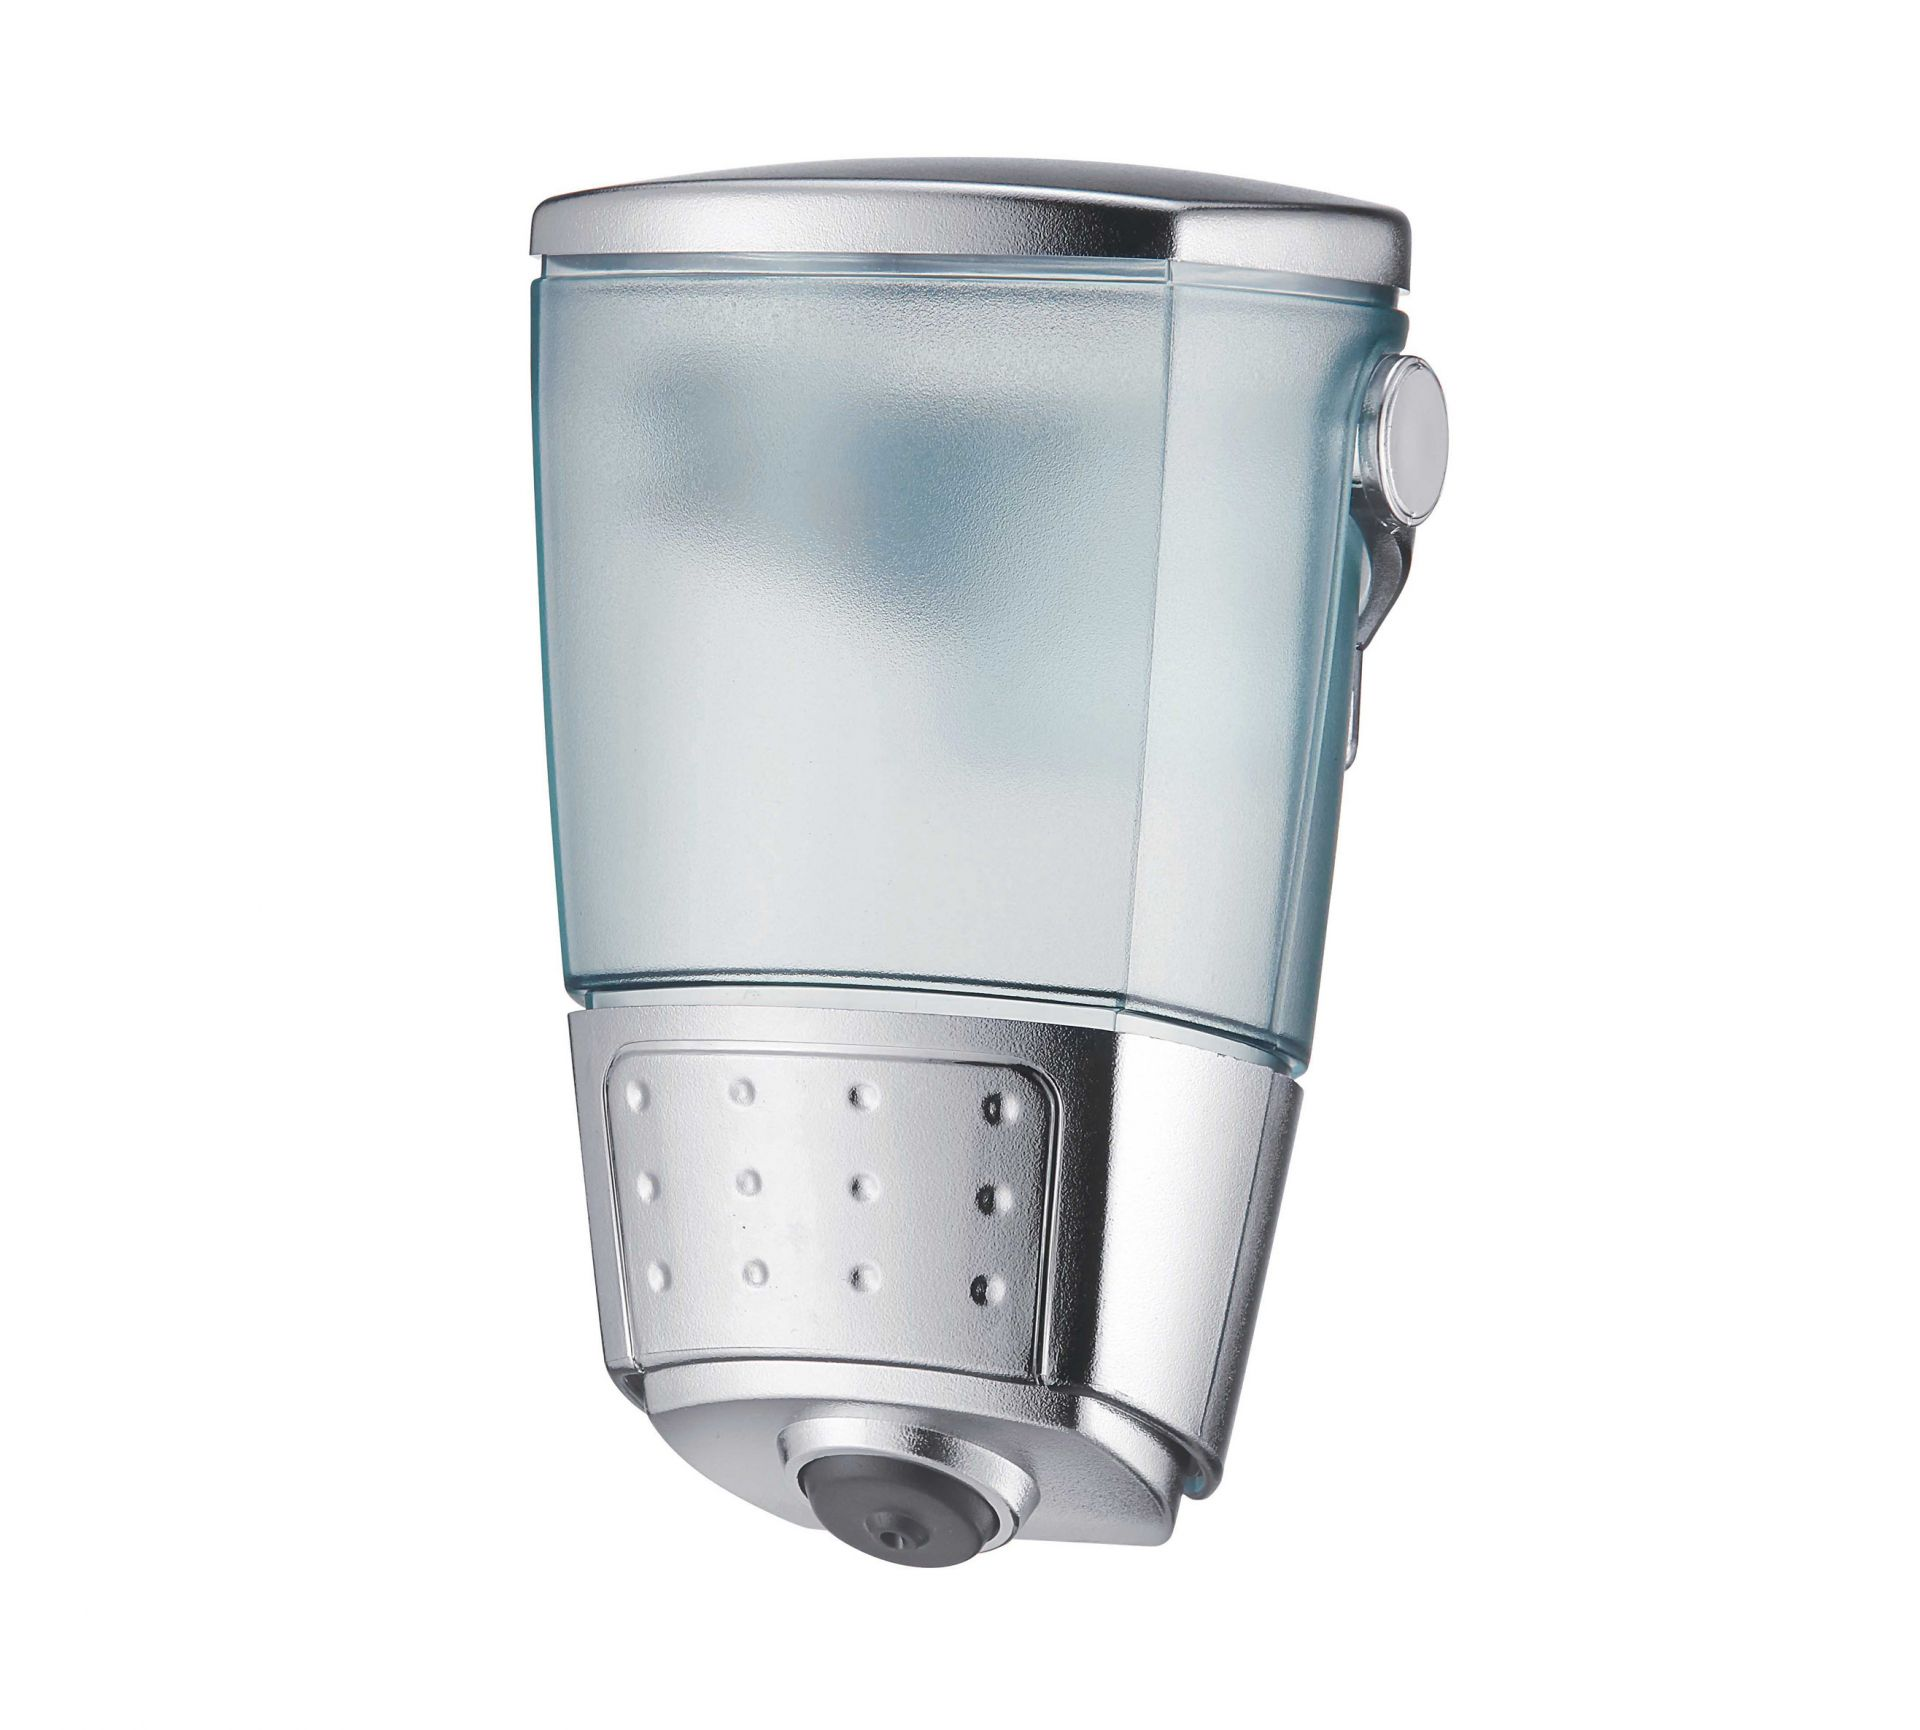 wastafel dispenser sabun